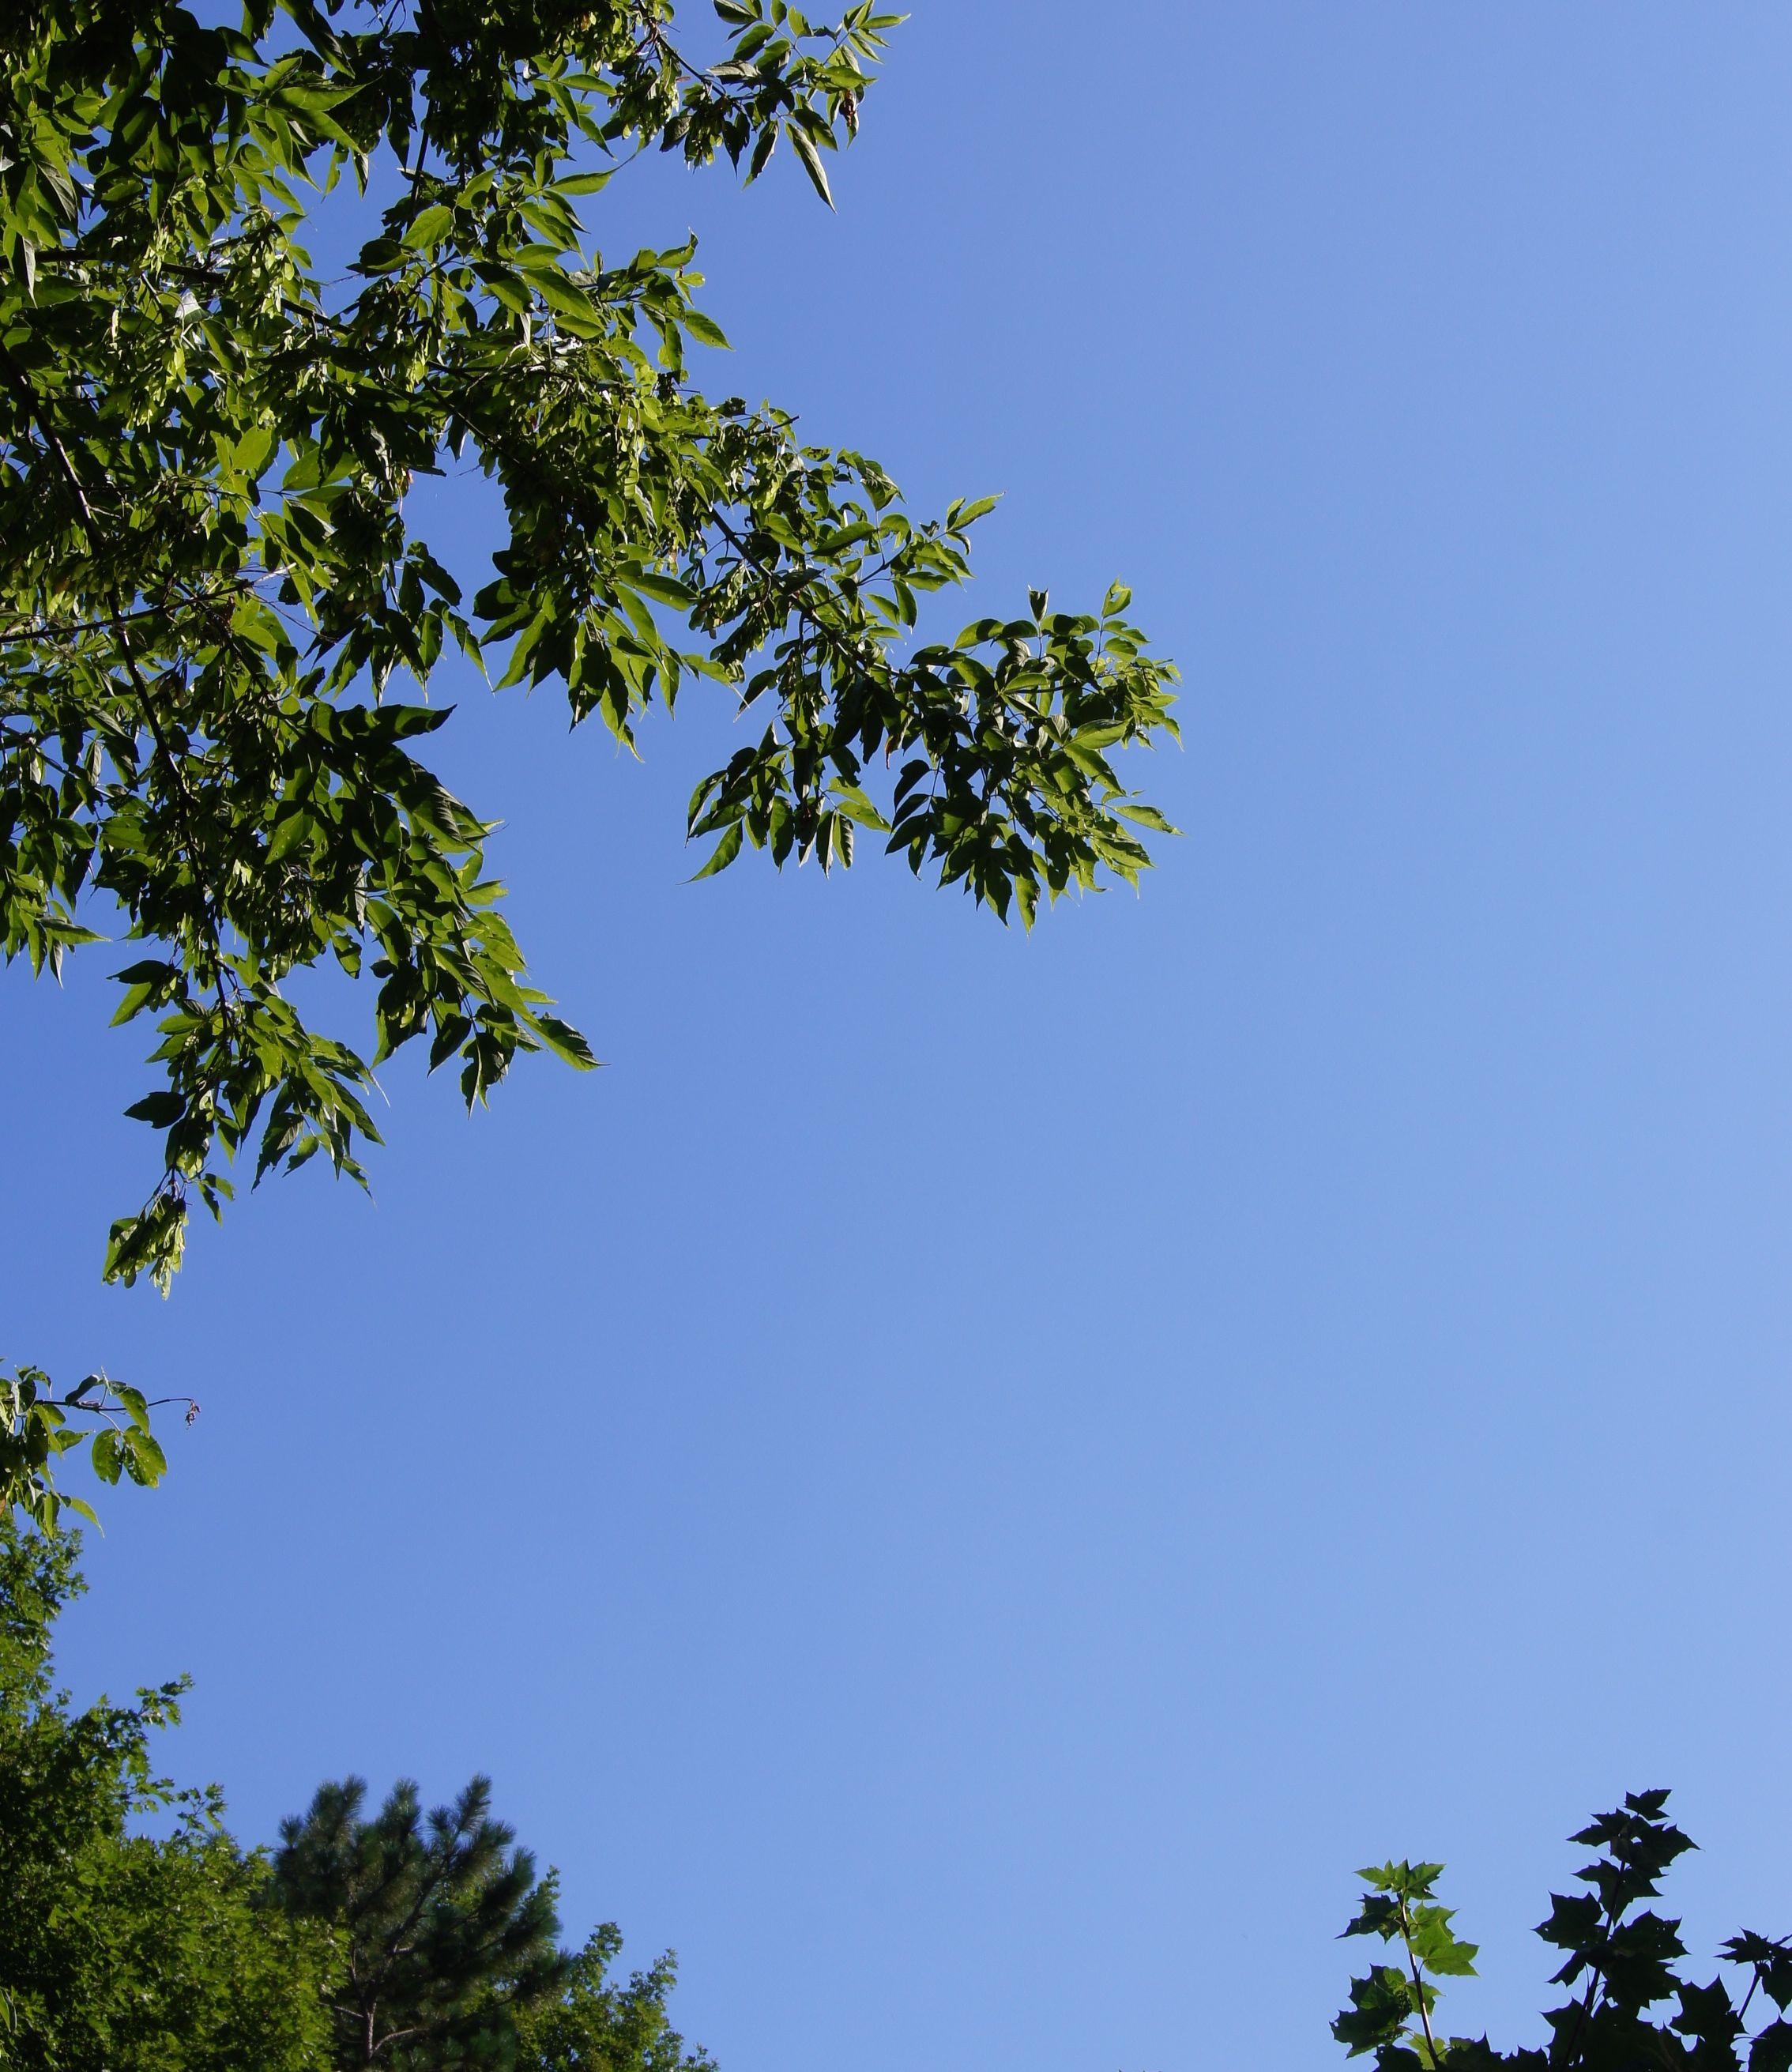 Sky blue on blue.jpg